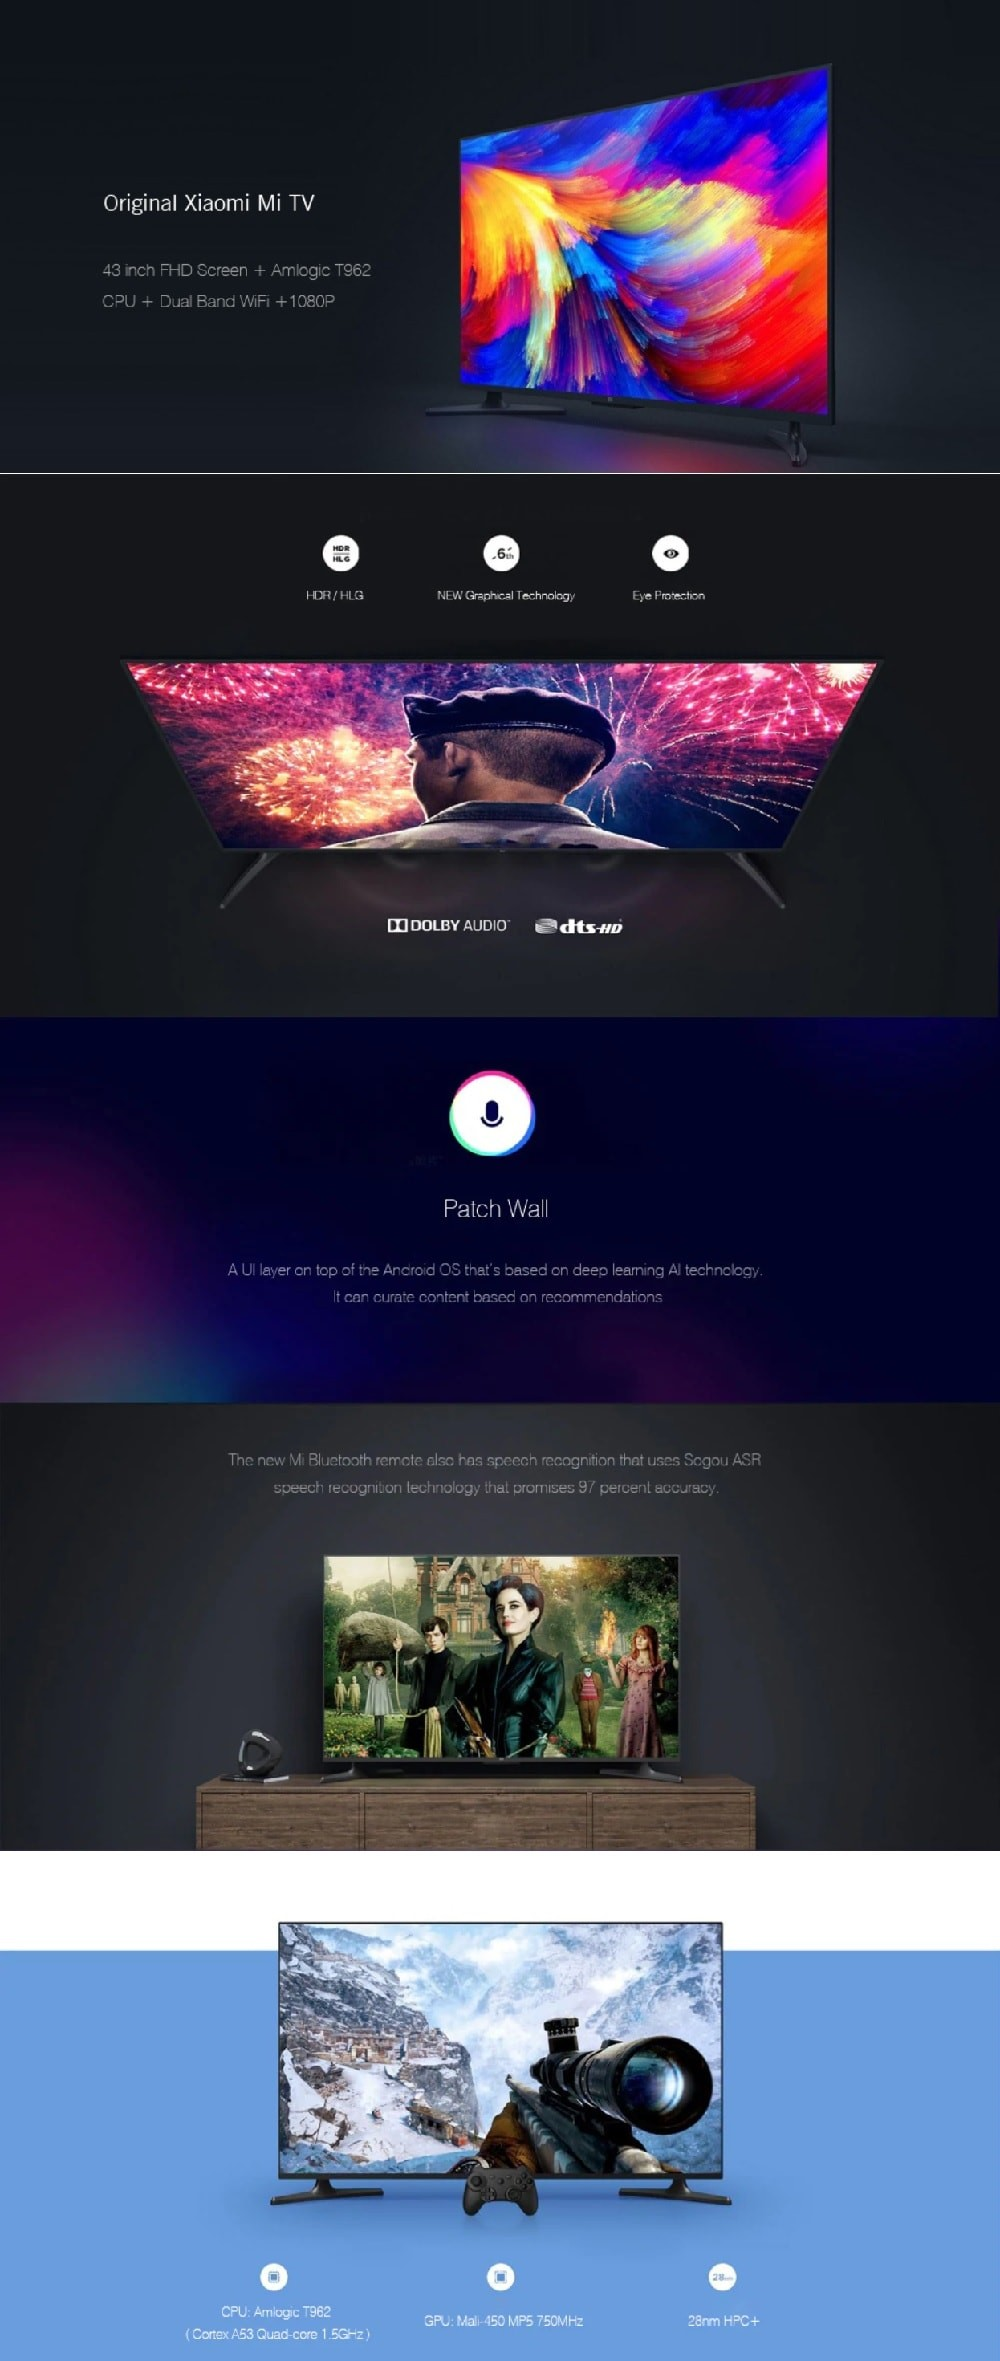 Prezentare-Xiaomi-Mi-TV-43-inch23898b384966f714.jpg